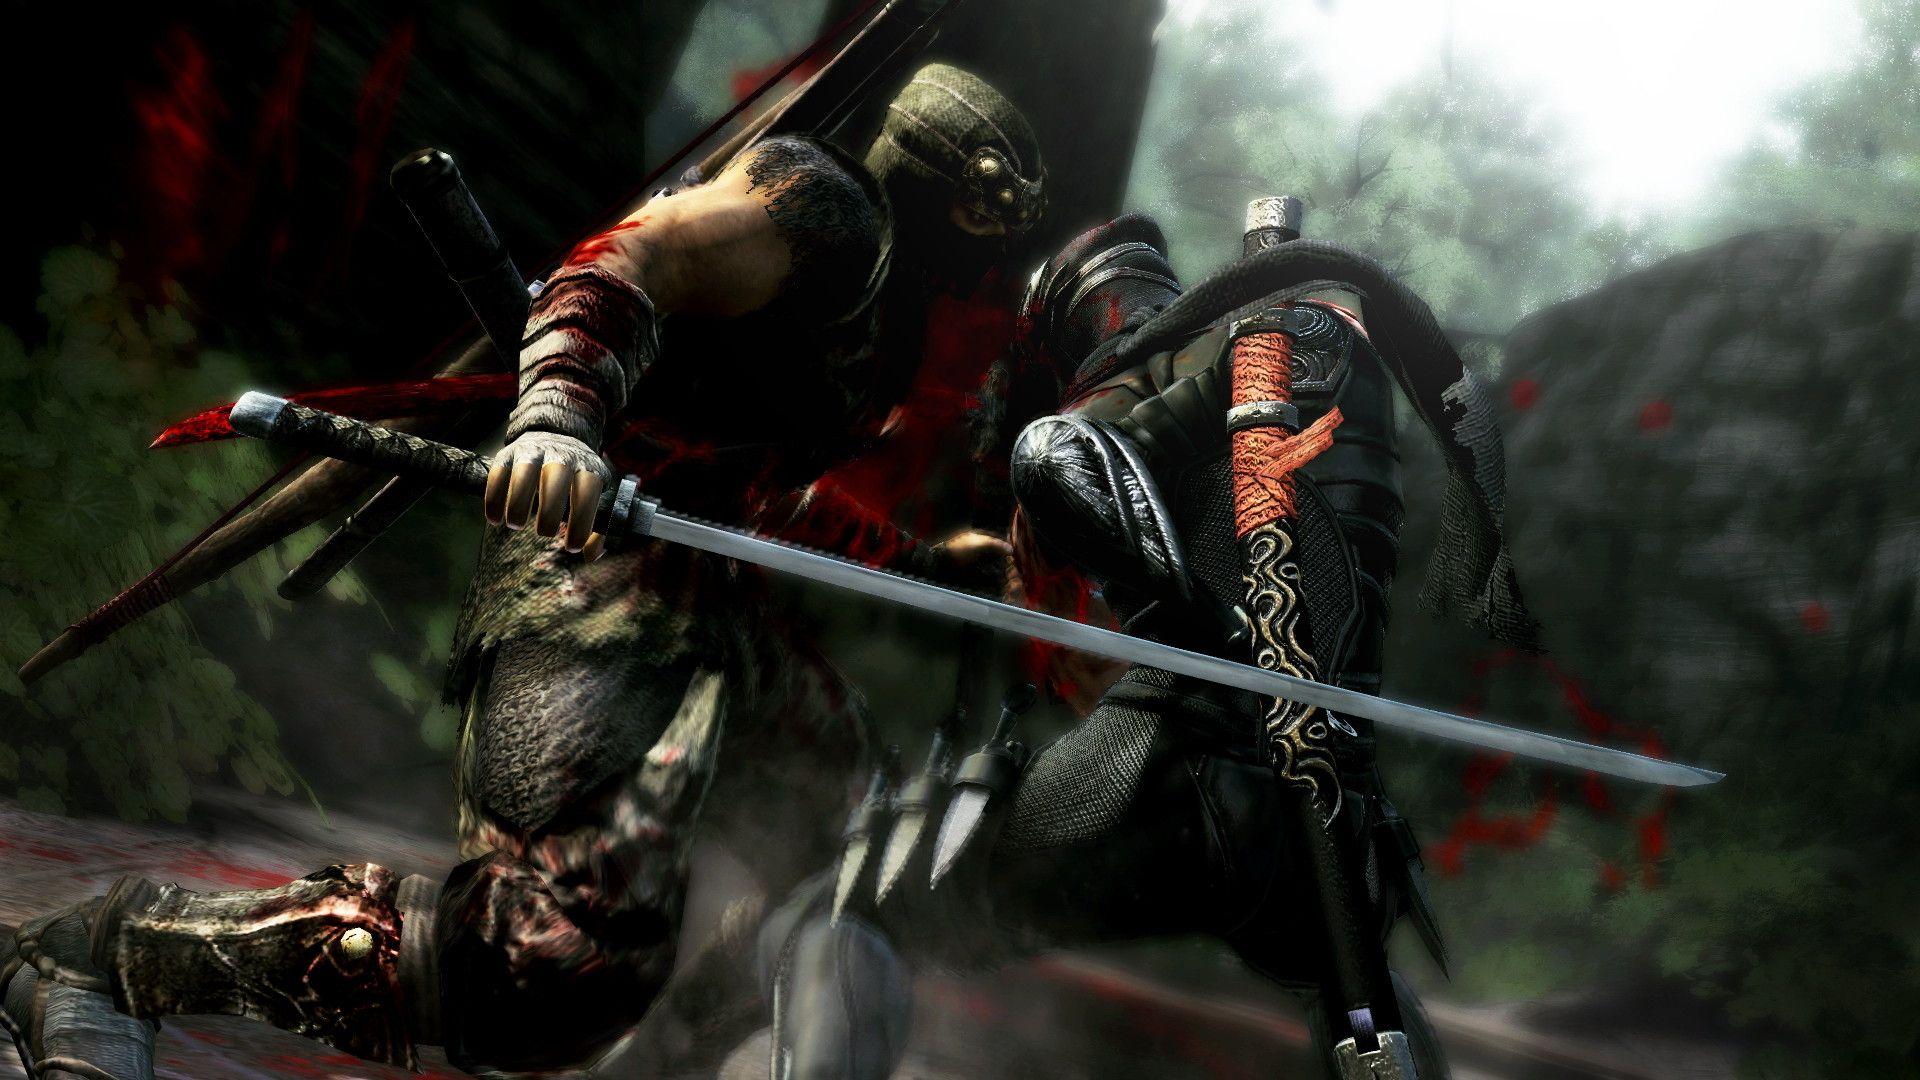 ninja warrior wallpaper